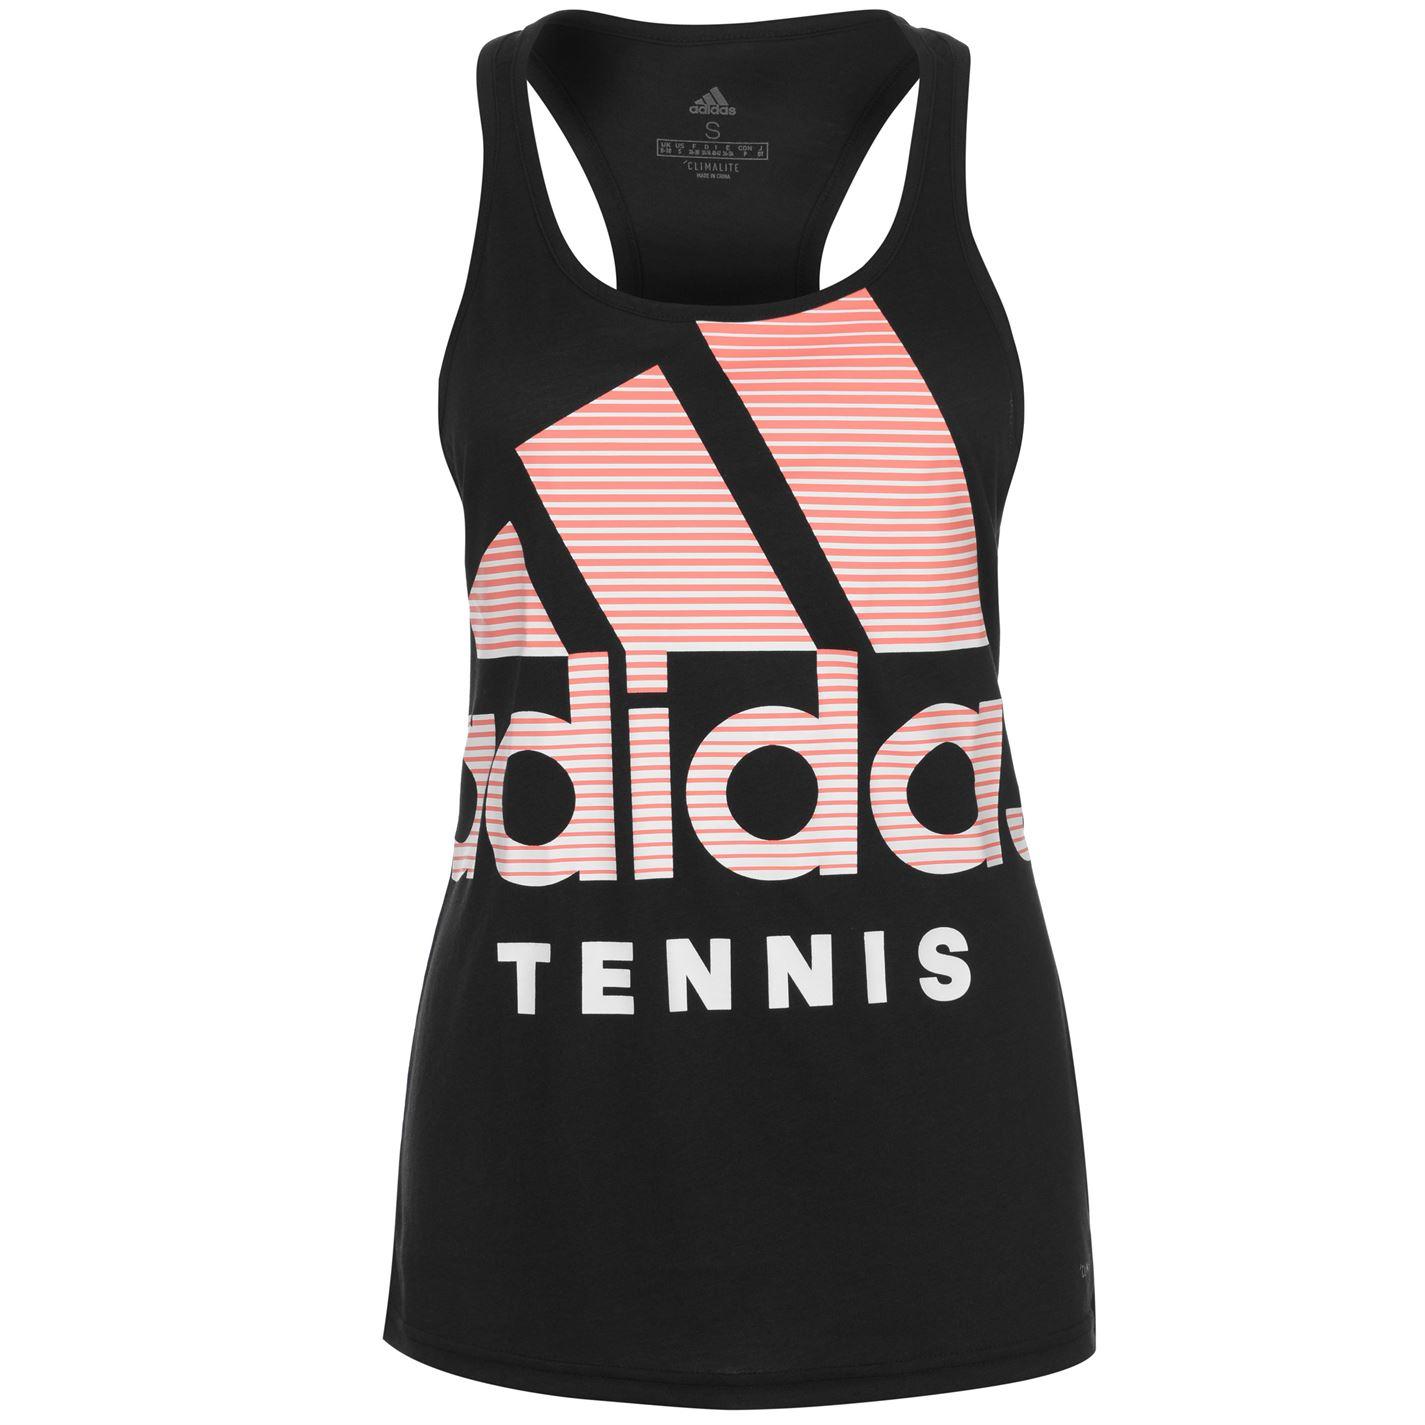 Adidas Category Tank Top Ladies